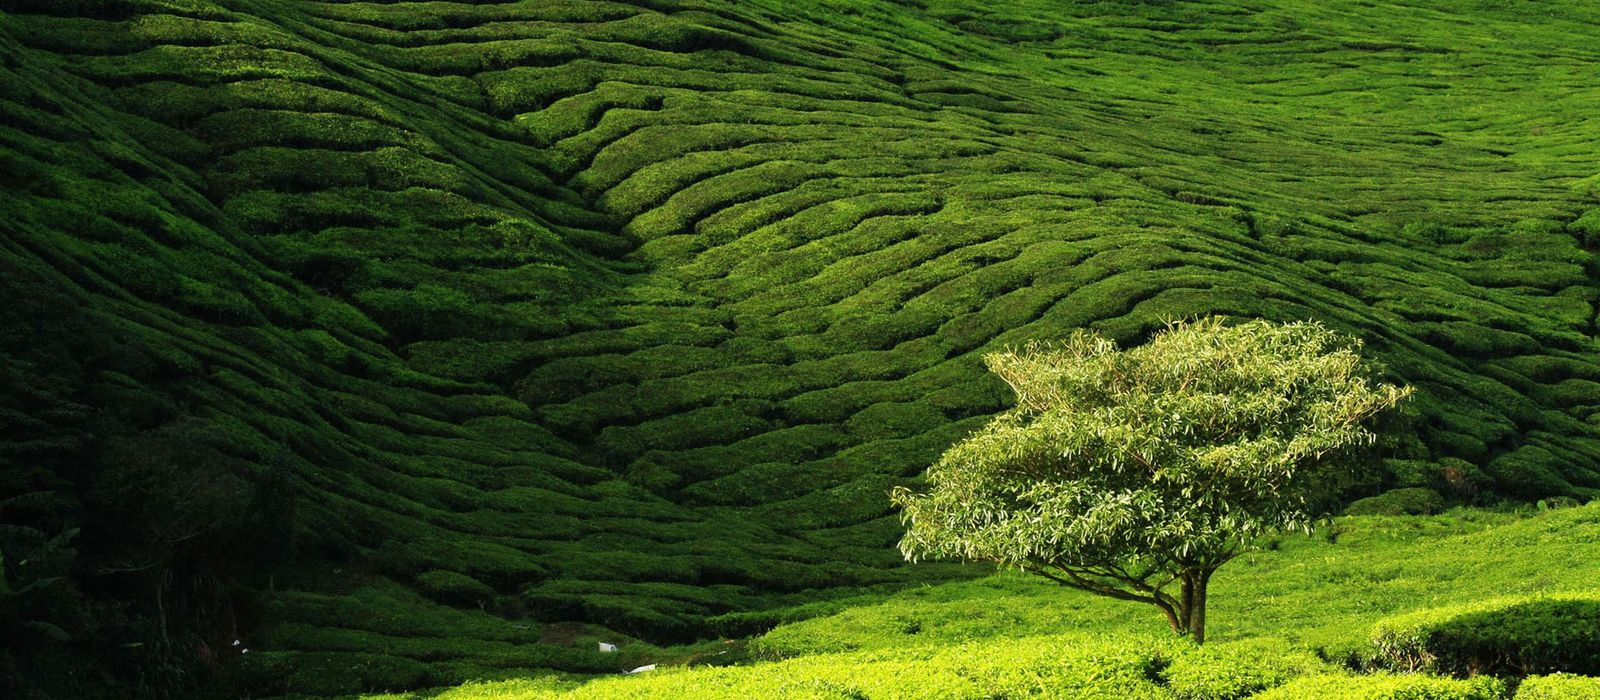 Höhepunkte der Halbinsel Malaysia Urlaub 2